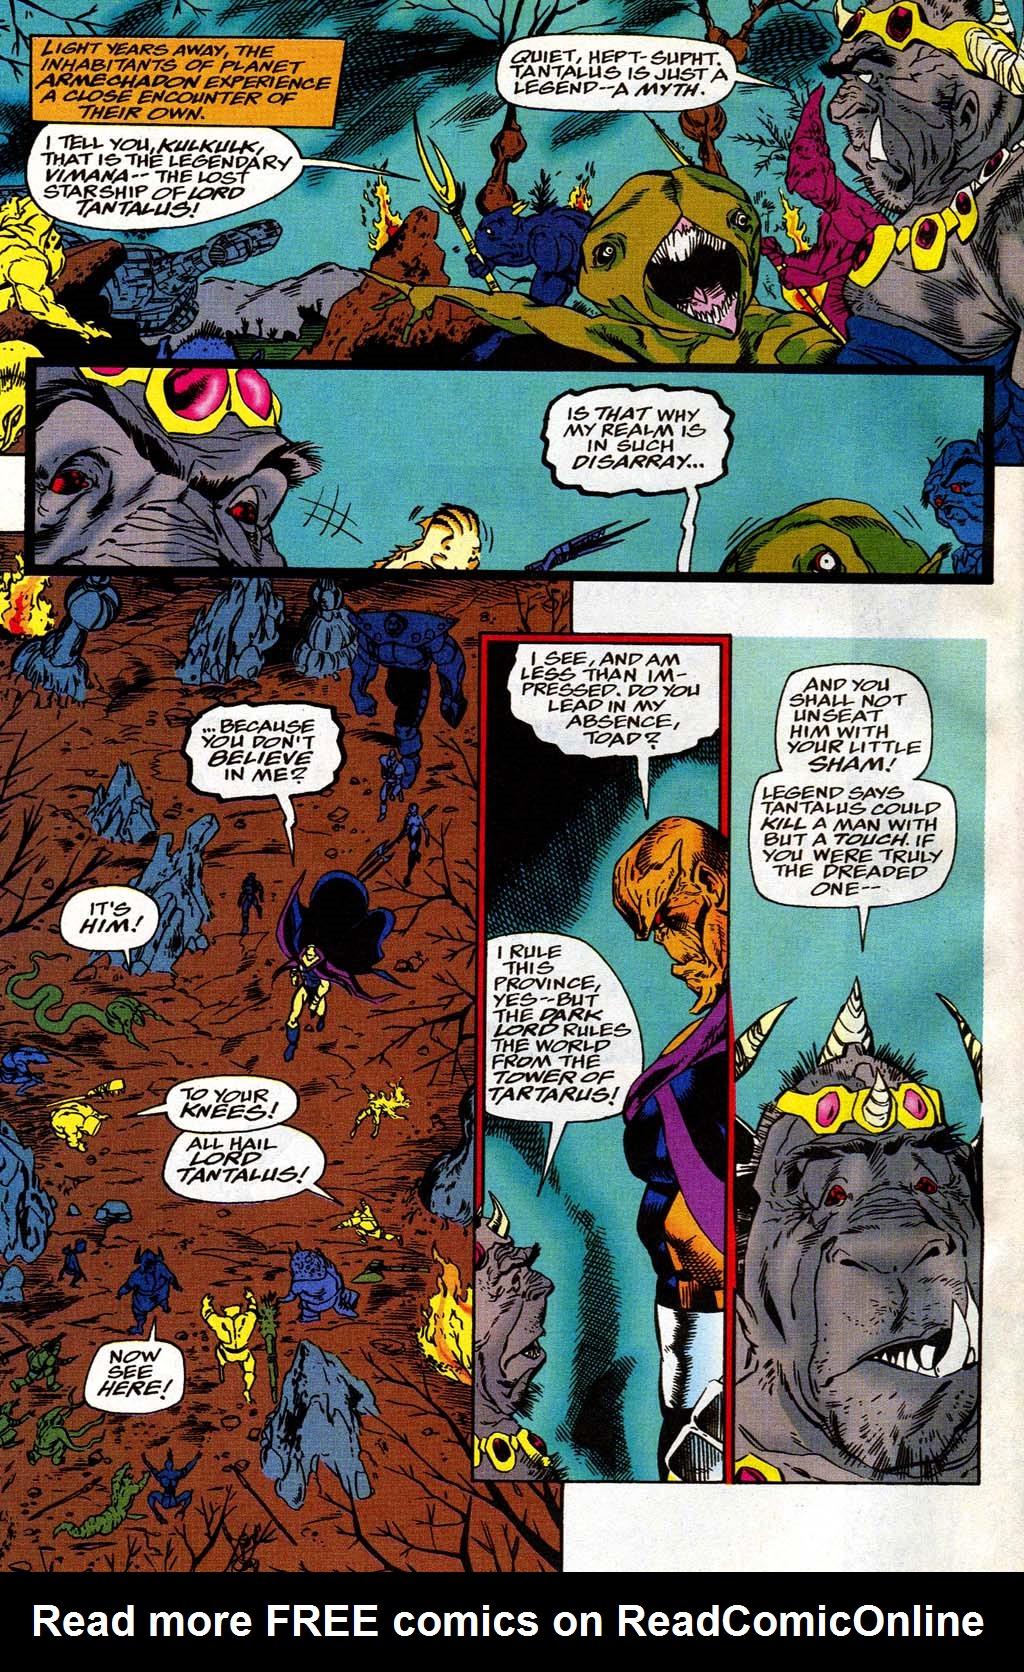 Read online Blackwulf comic -  Issue #8 - 7